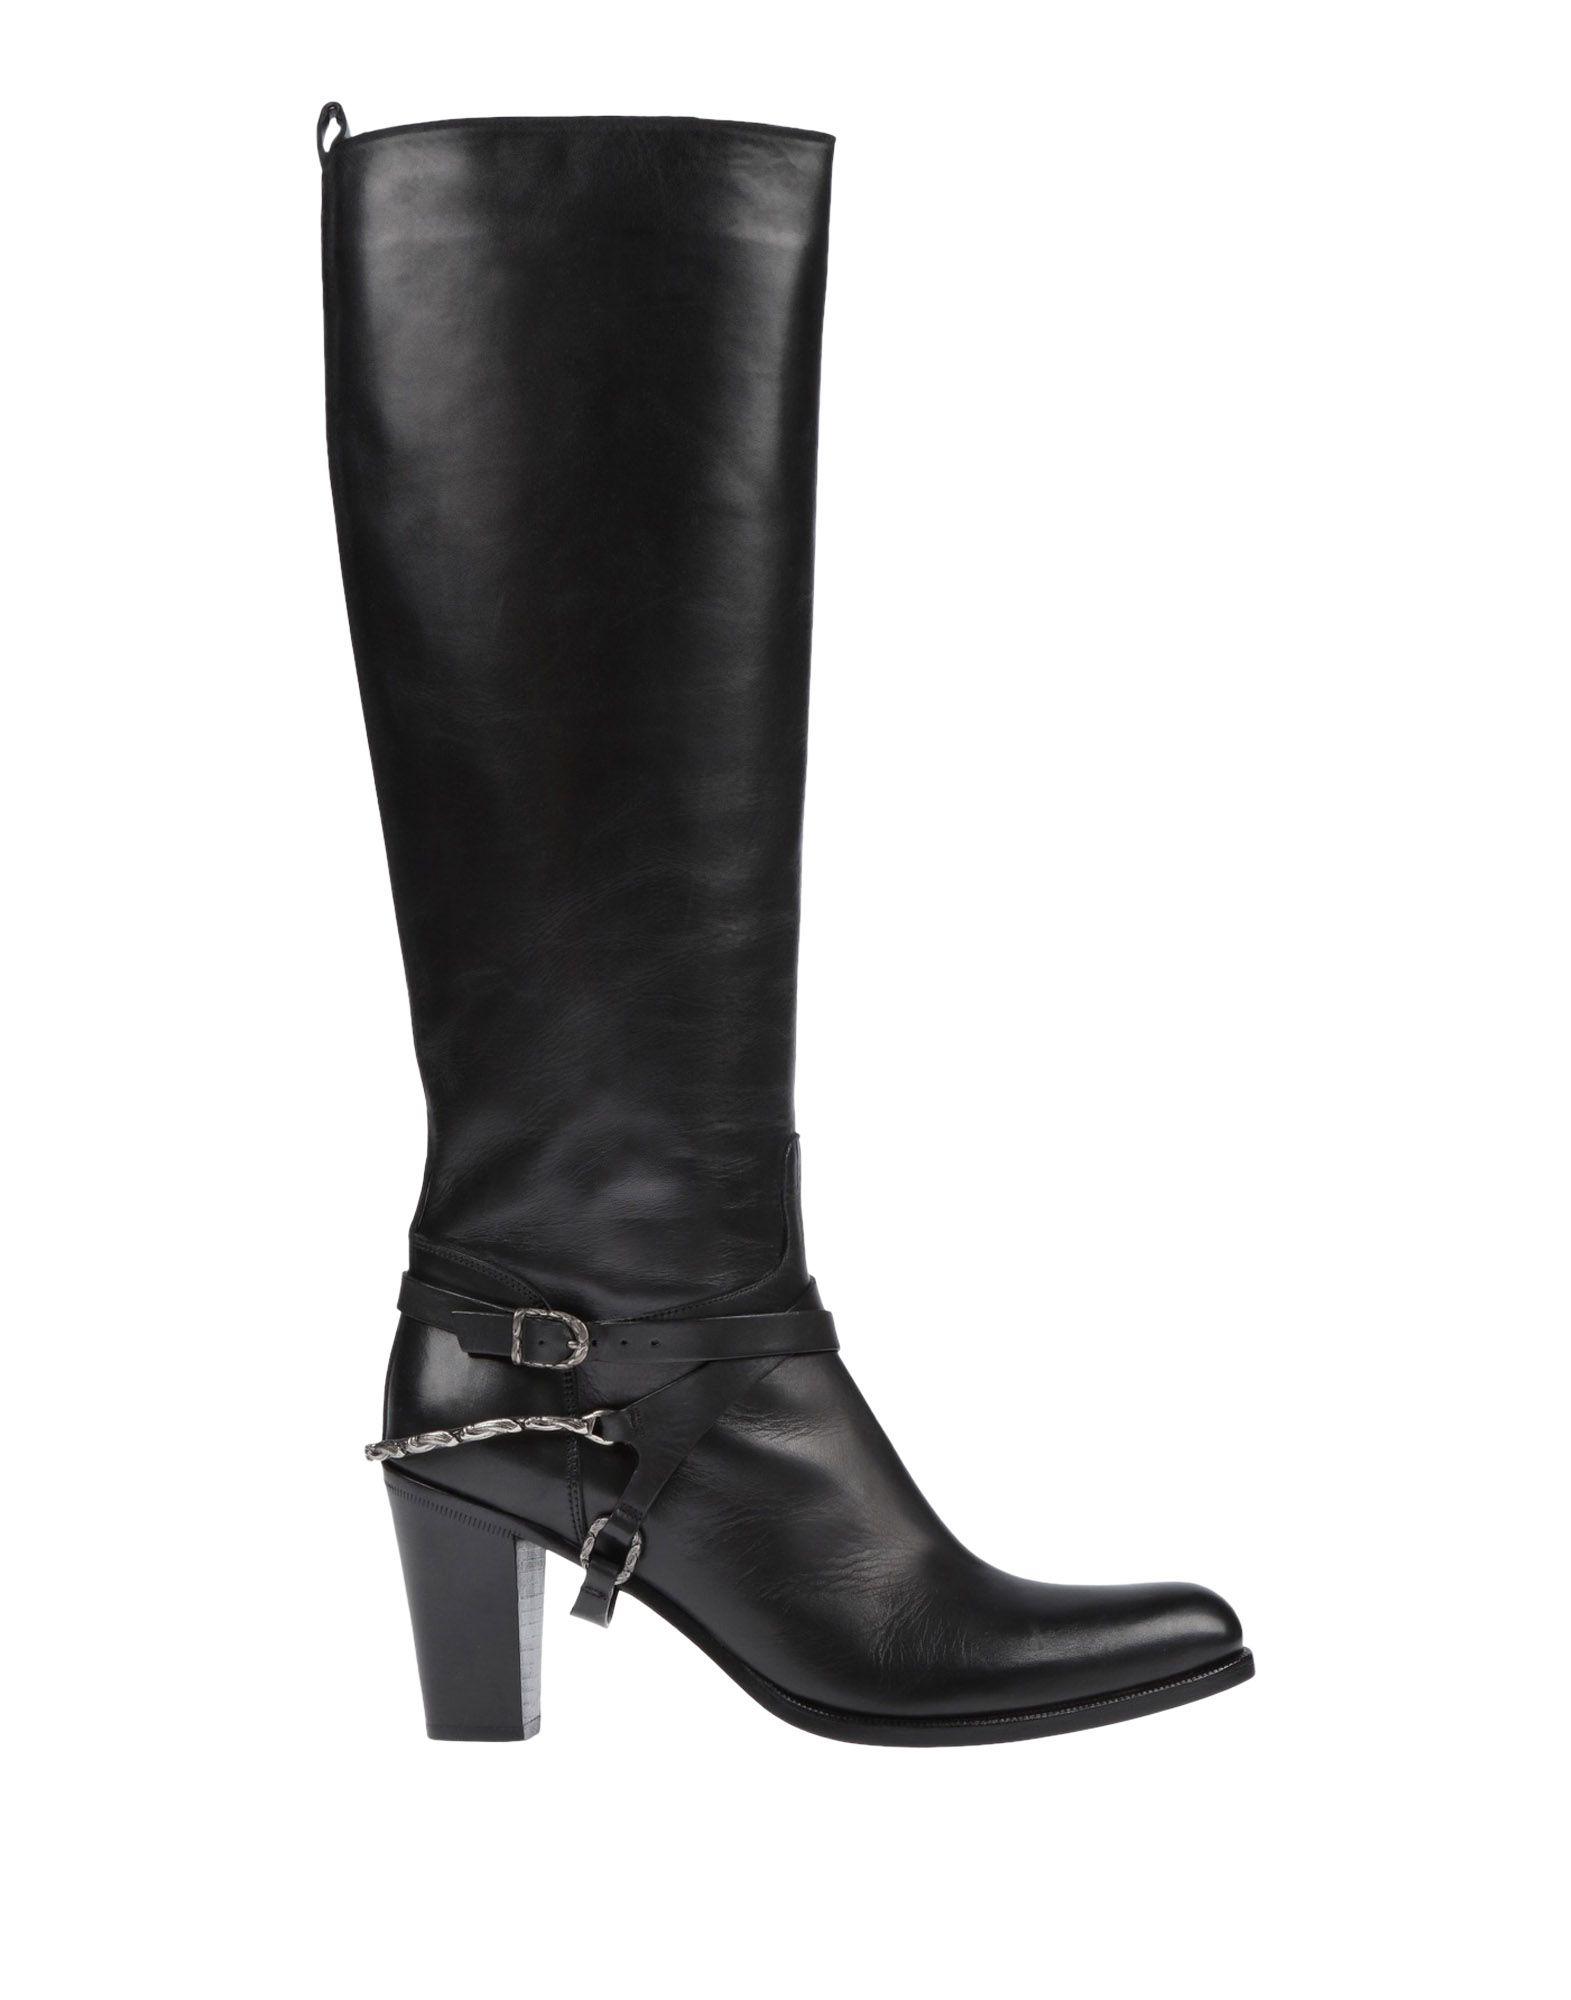 Sartore Boots - Women Sartore Boots online on    United Kingdom - 11527266CB 9b328e